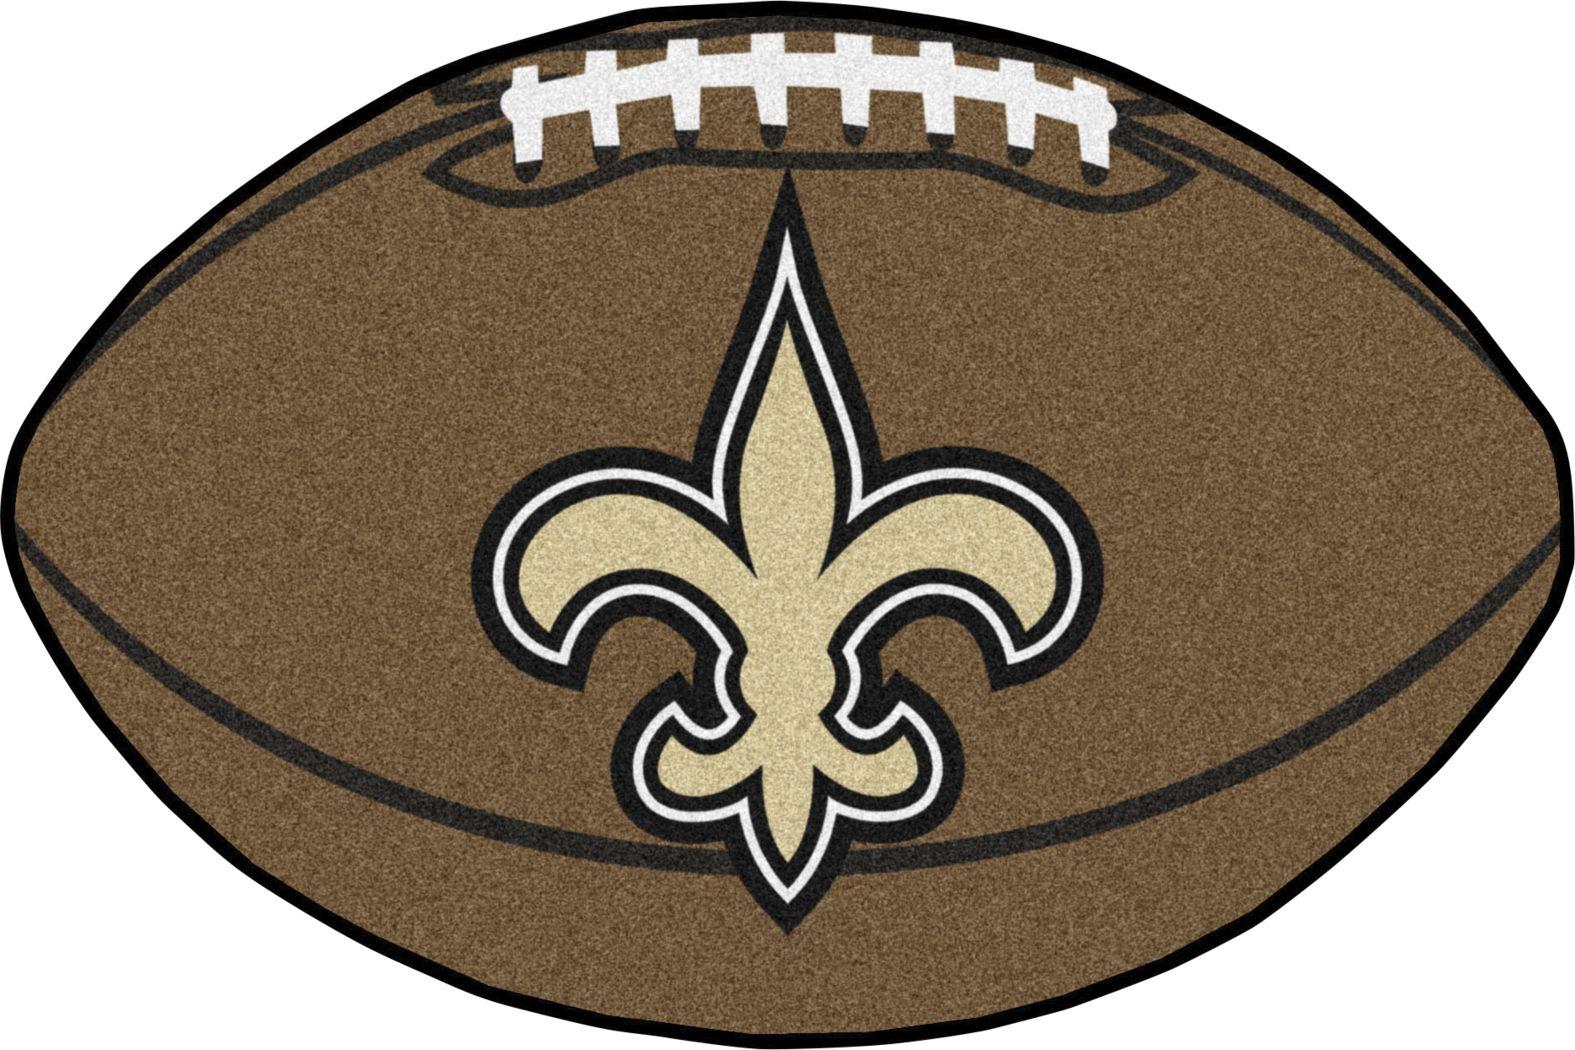 "NFL Football Mascot New Orleans Saints 1'6""x 1'10"" Rug"